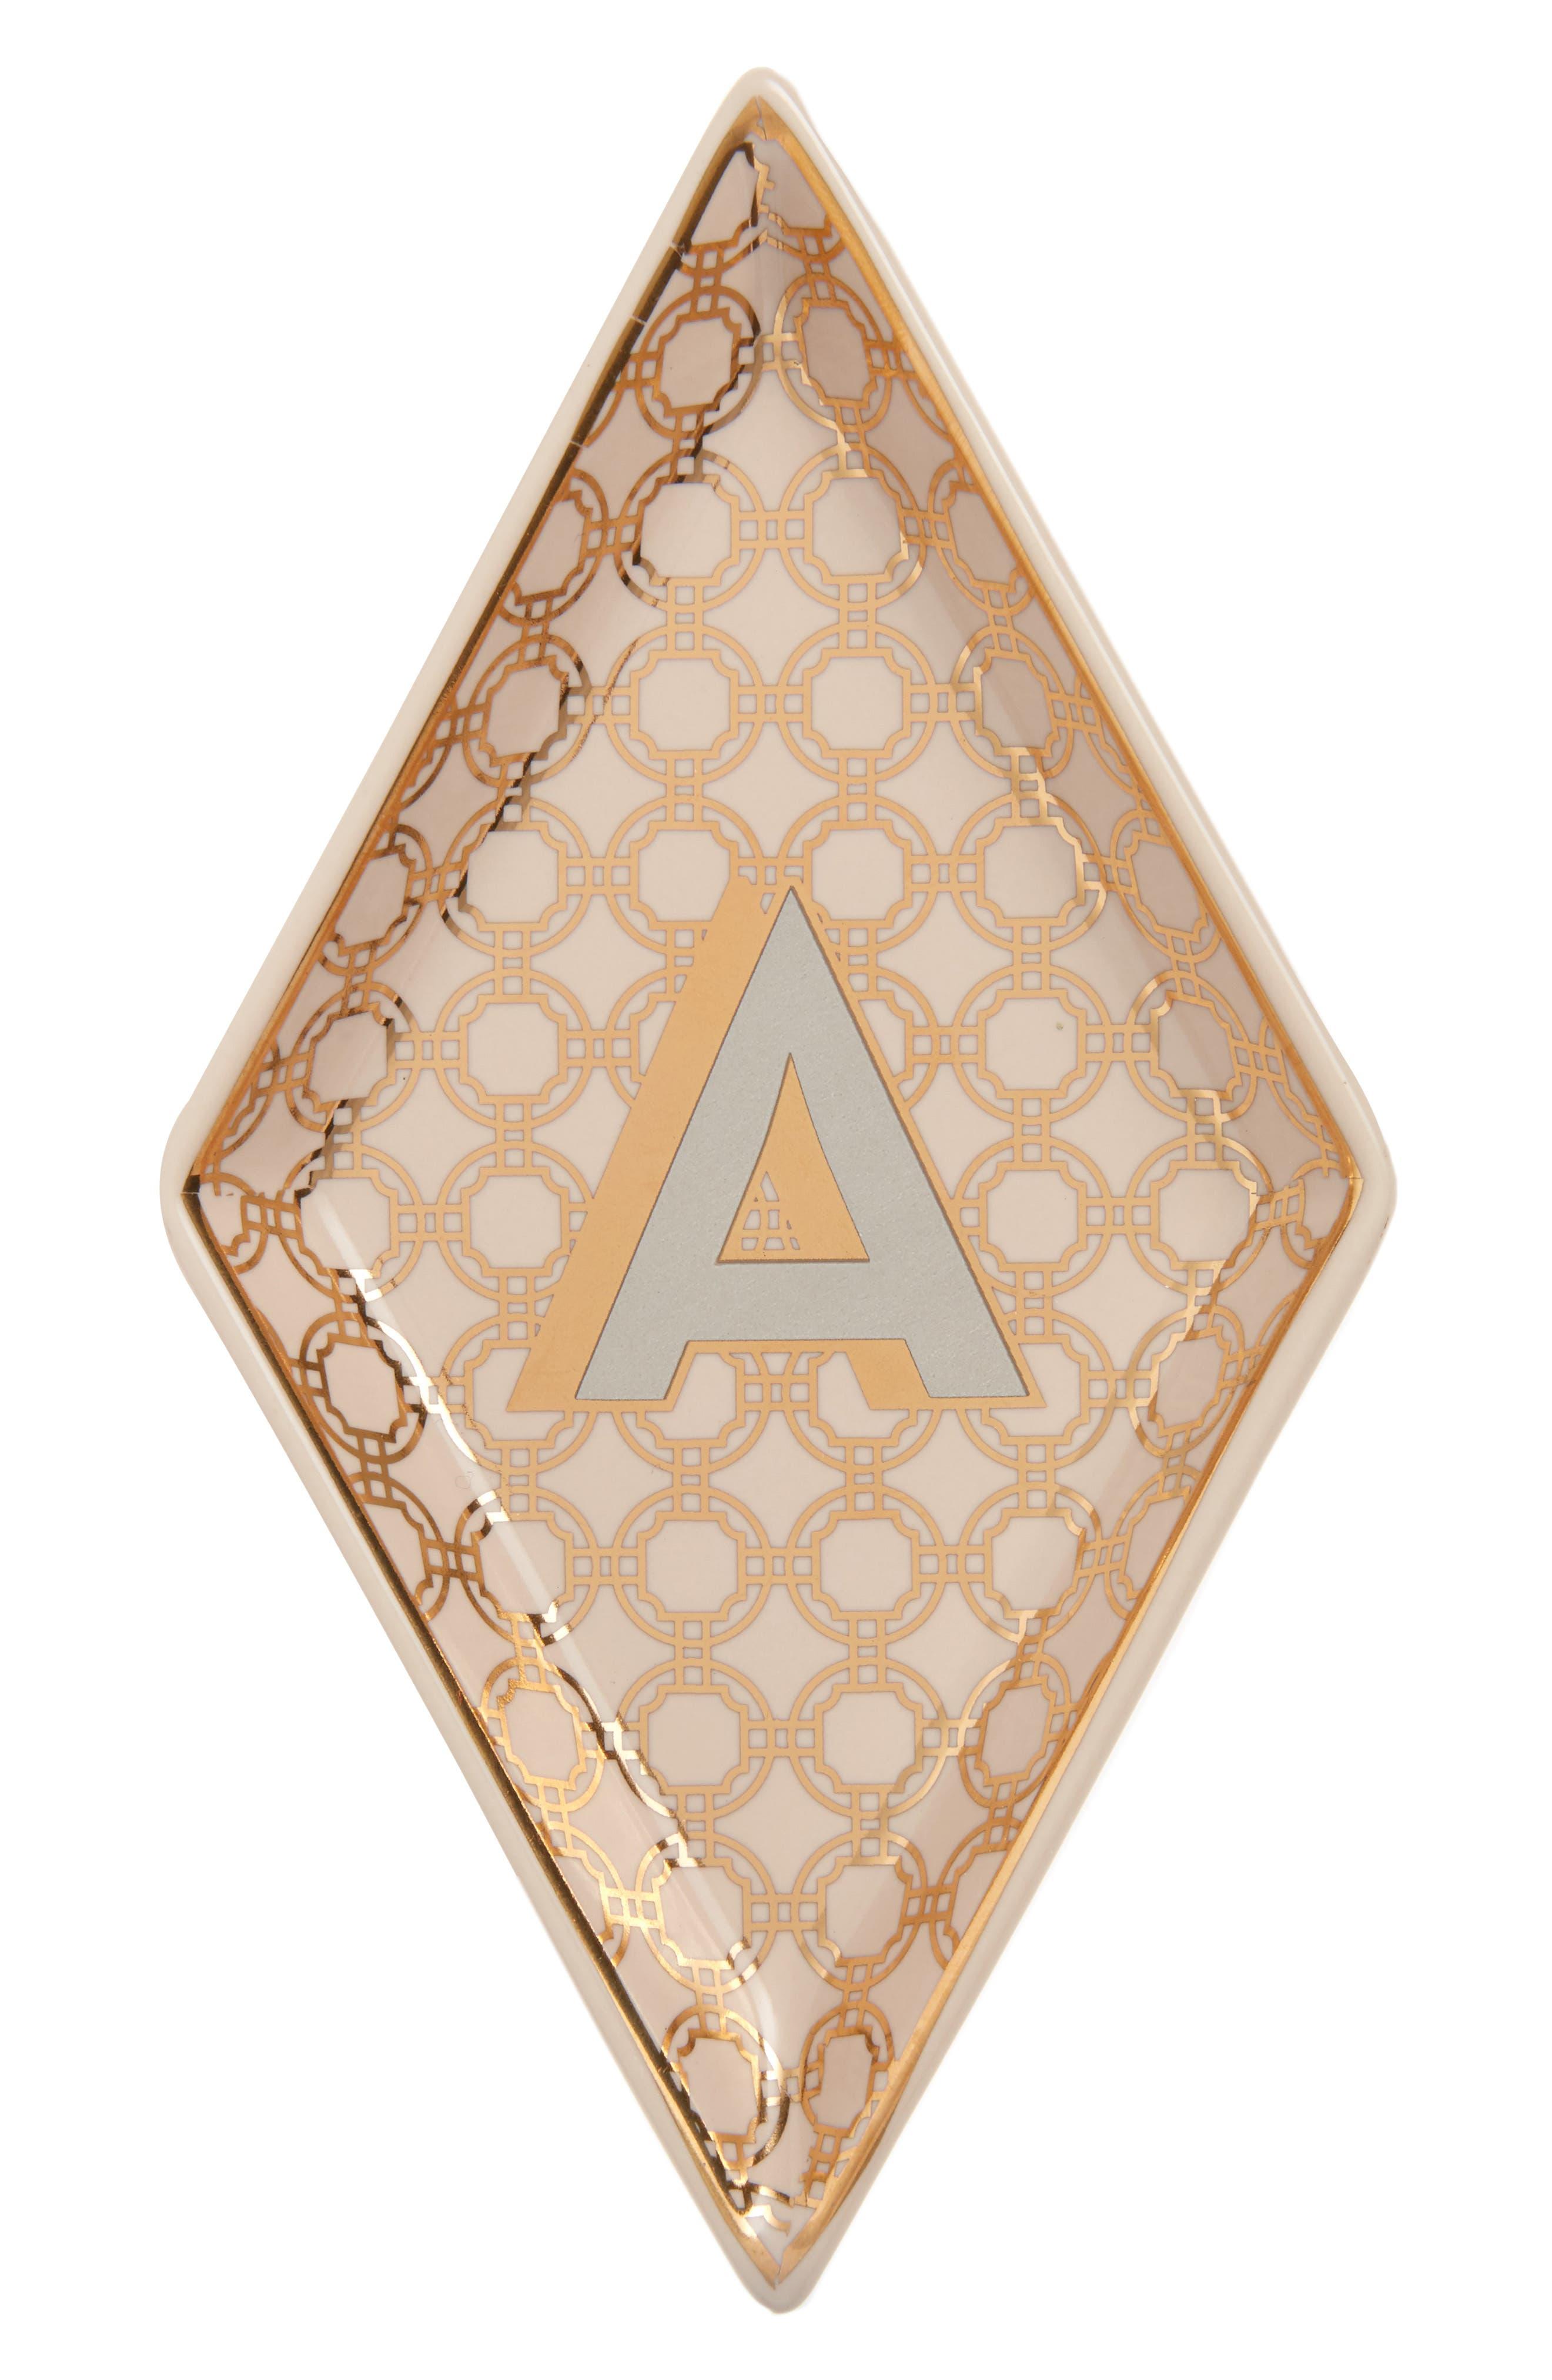 Alternate Image 1 Selected - Roseanna Porcelain Alphabet Trinket Tray (Nordstrom Exclusive)